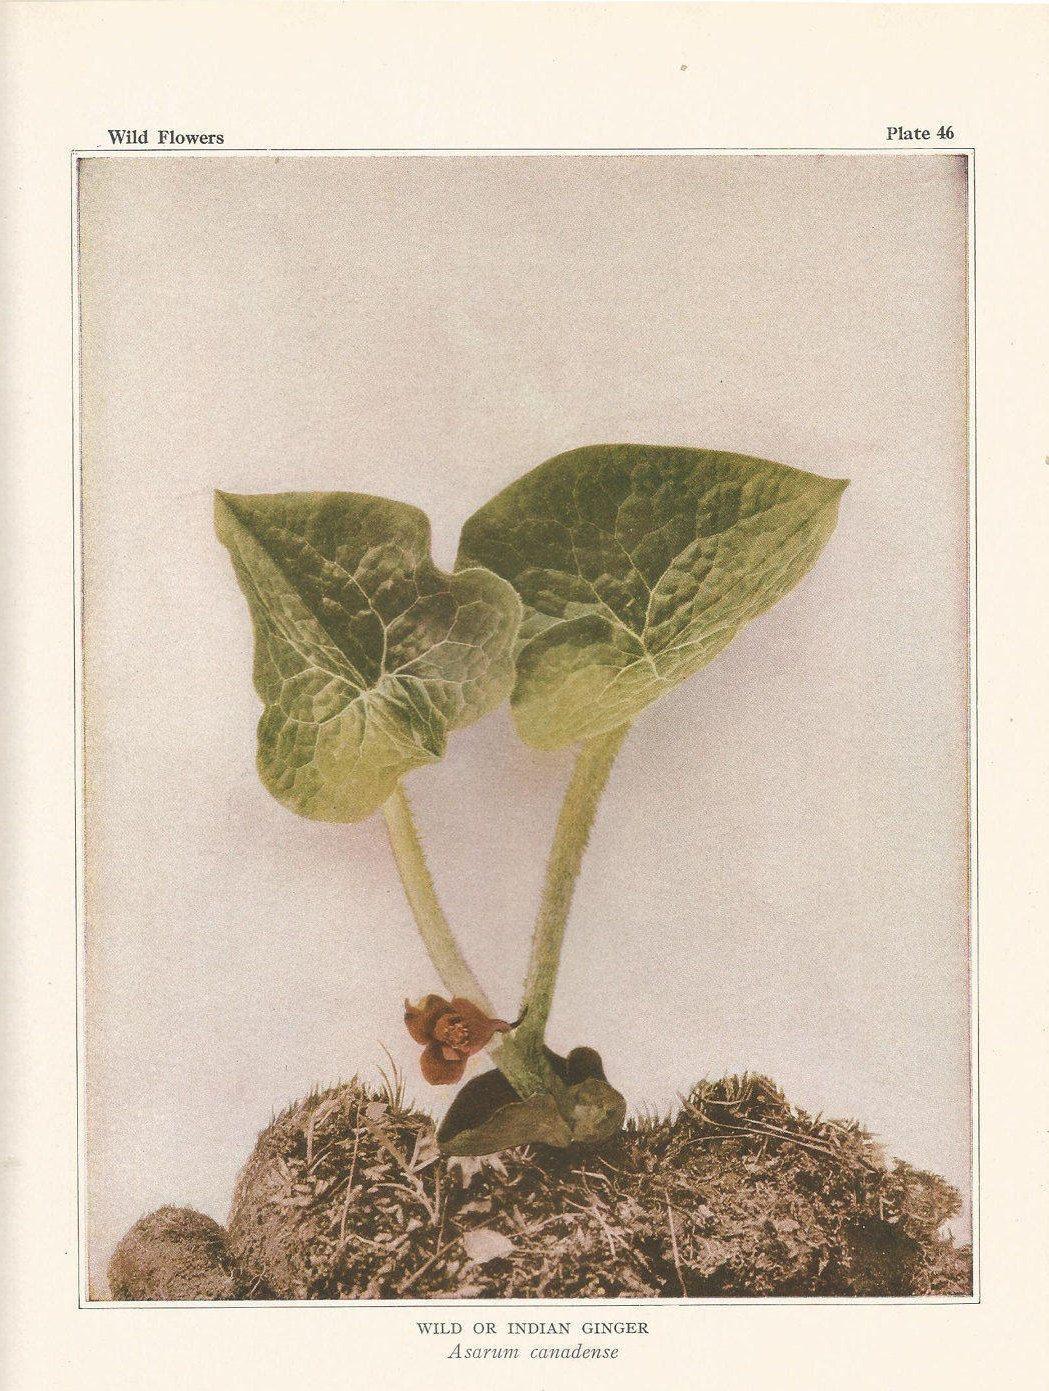 Indian Ginger Antique Botanical Wildflower Art Print For Chef Herbalist Gardener Naturalist Vintage Na Vintage Flower Prints Botanical Poster Nature Prints